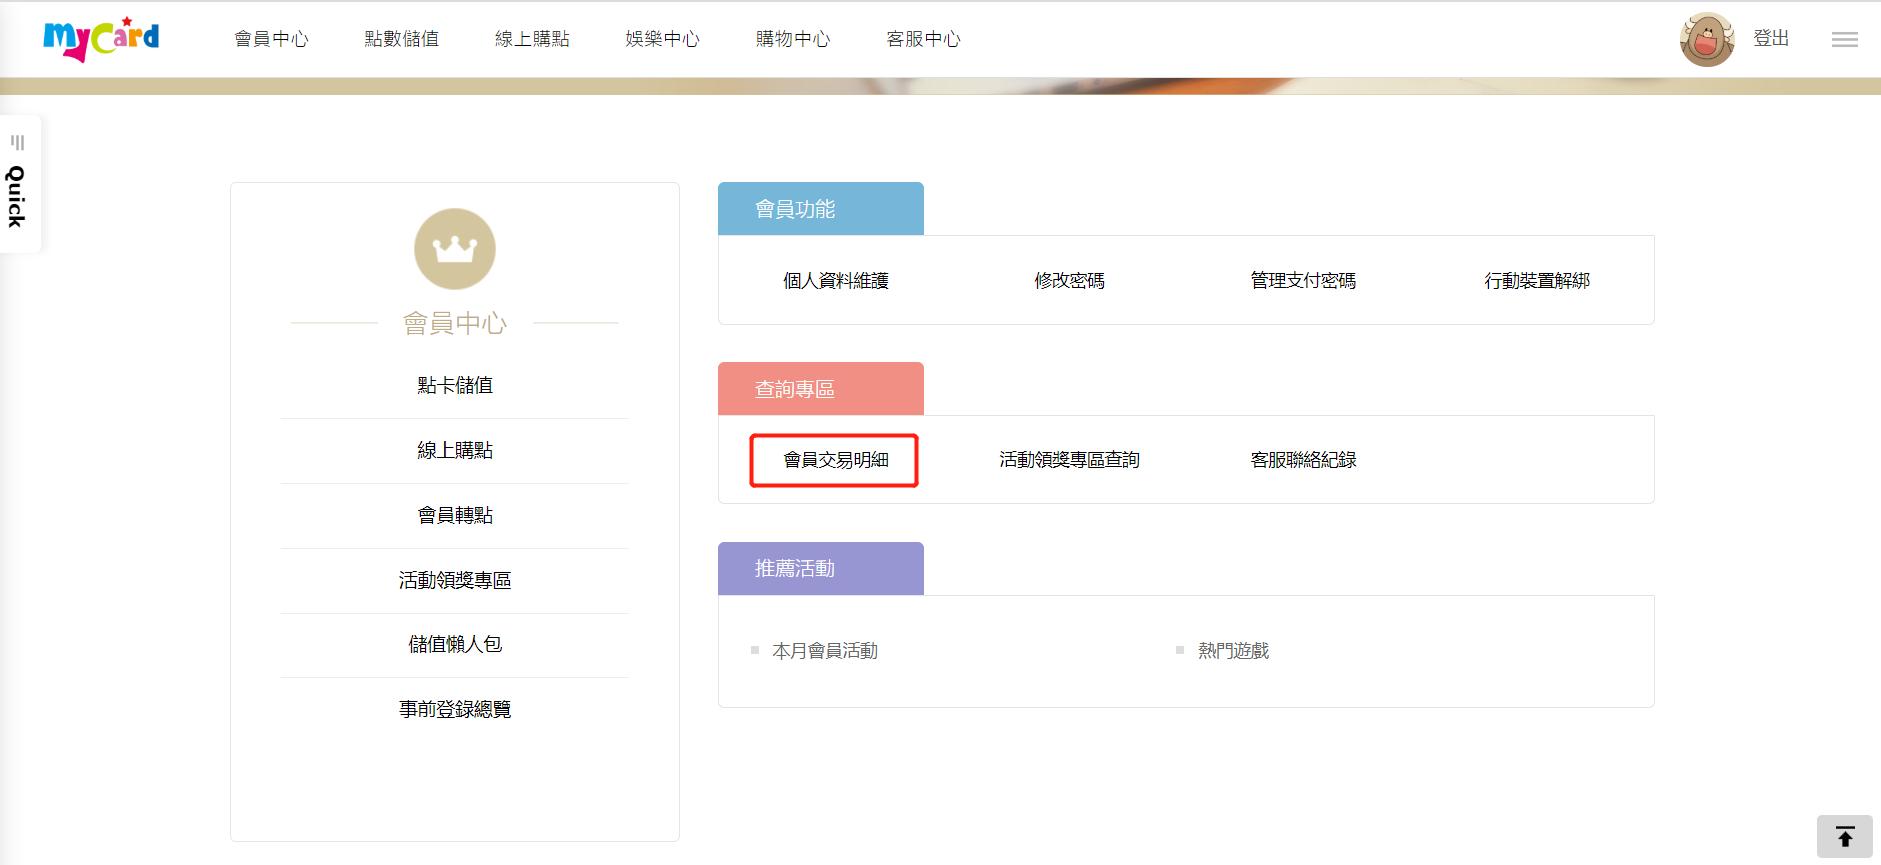 Mycard储值活动详细流程指南-查询交易序号.png